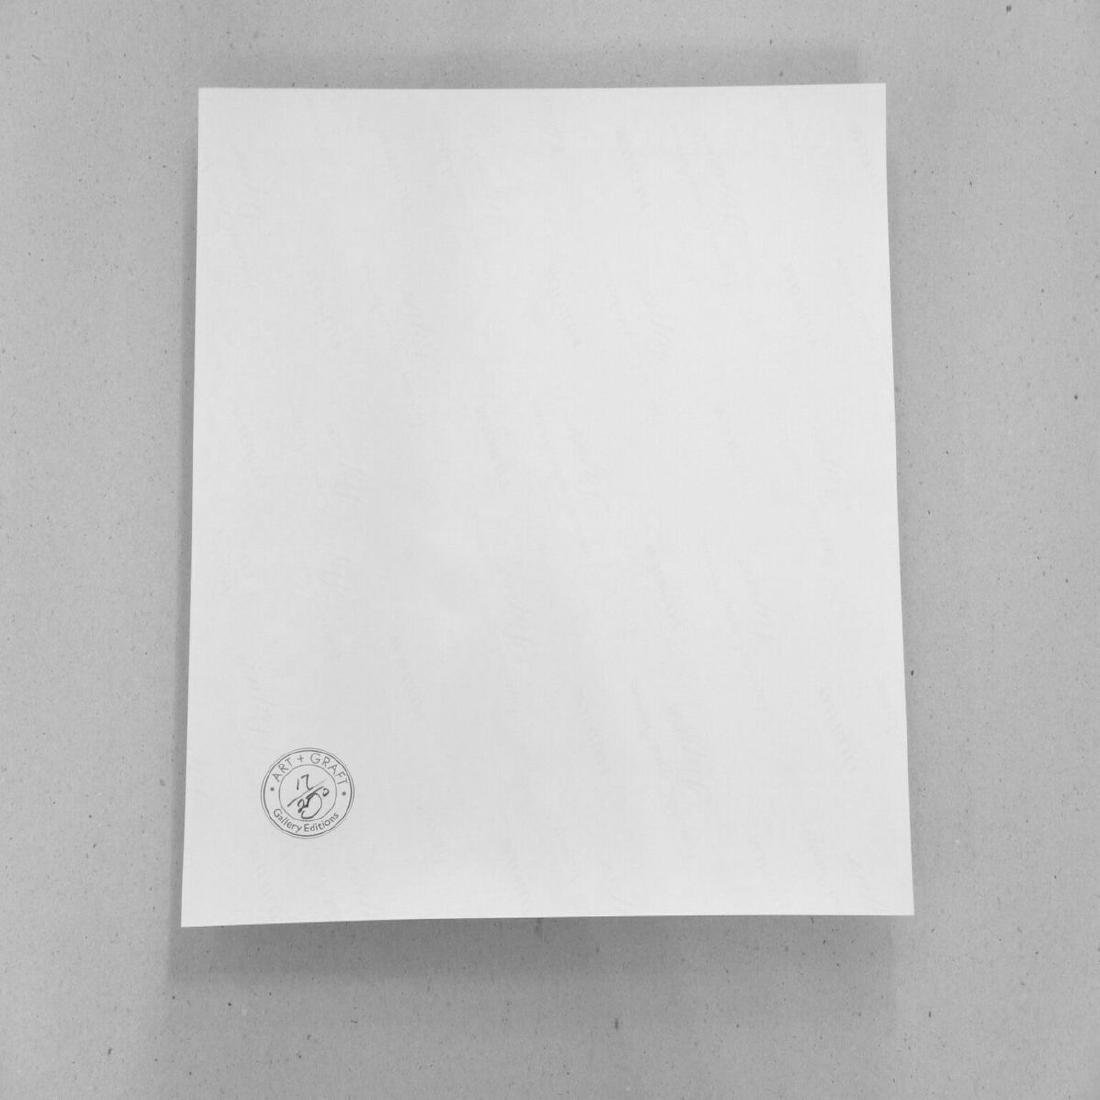 Beata Bieniak Chromogenic Print Flying Circus - 6